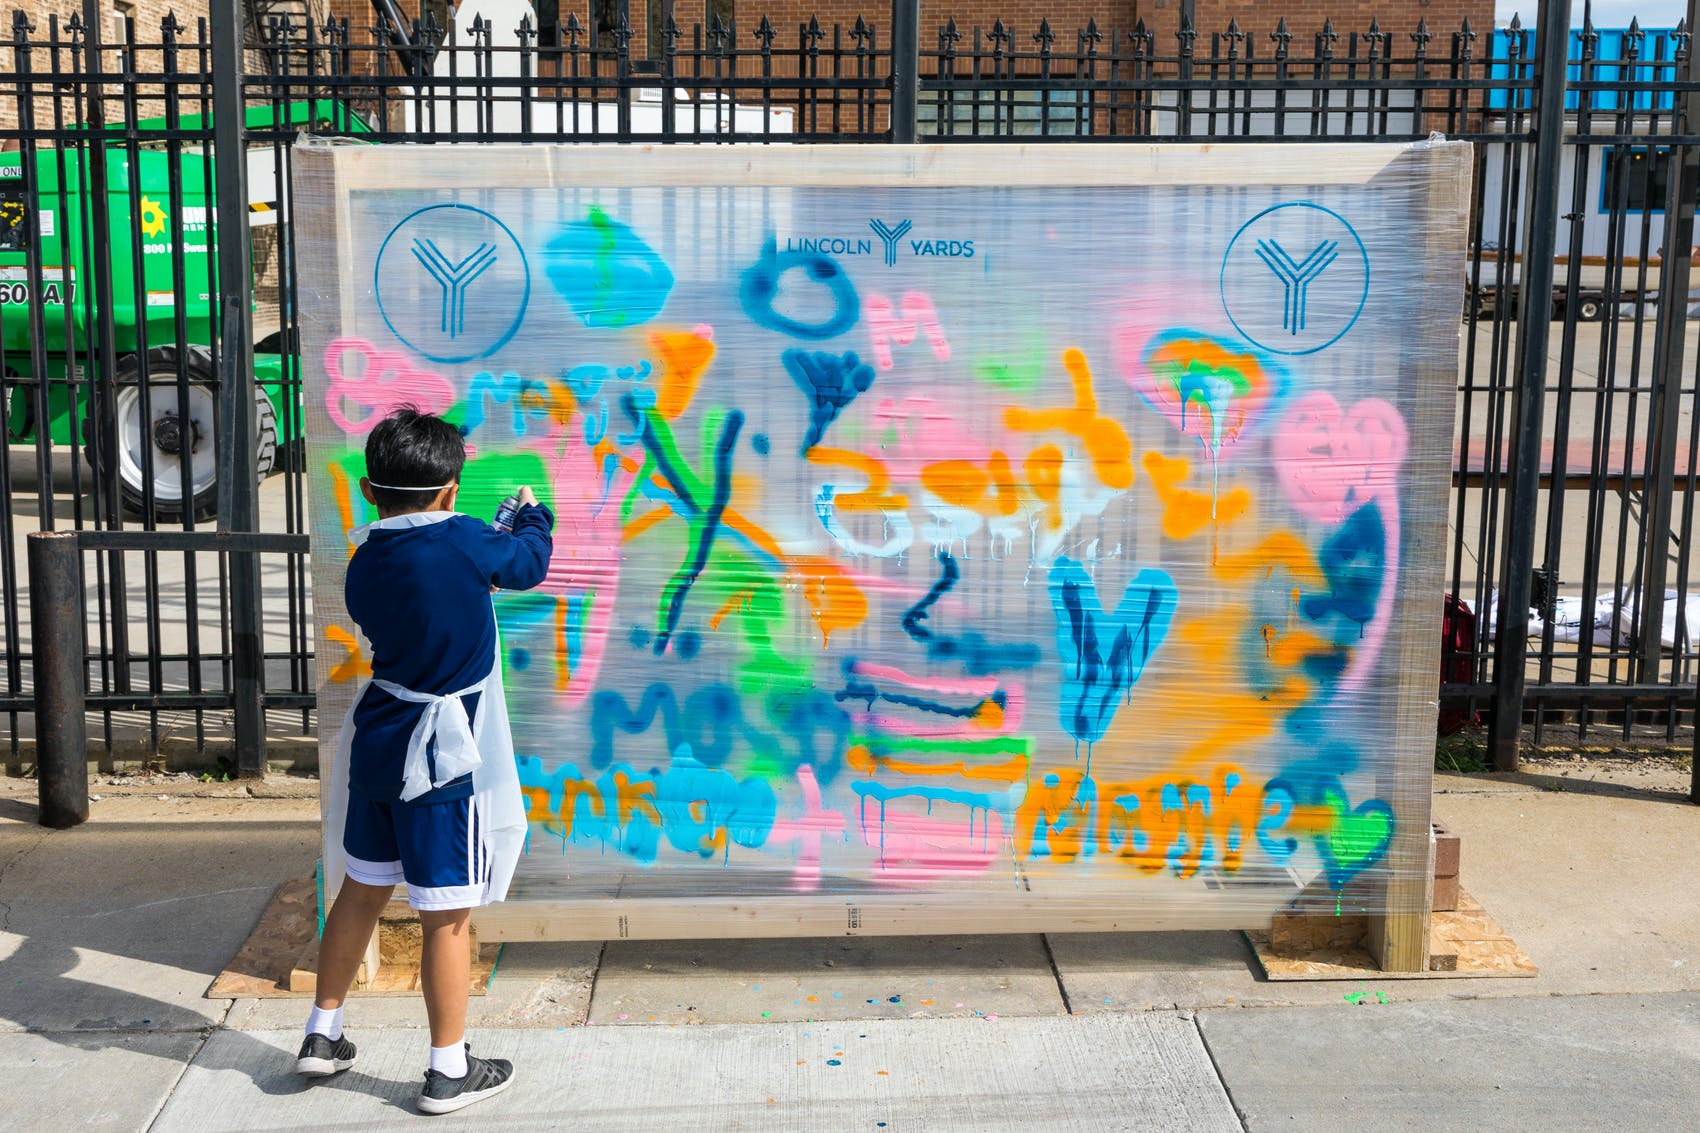 boy creating canvas graffiti art at chicago community event